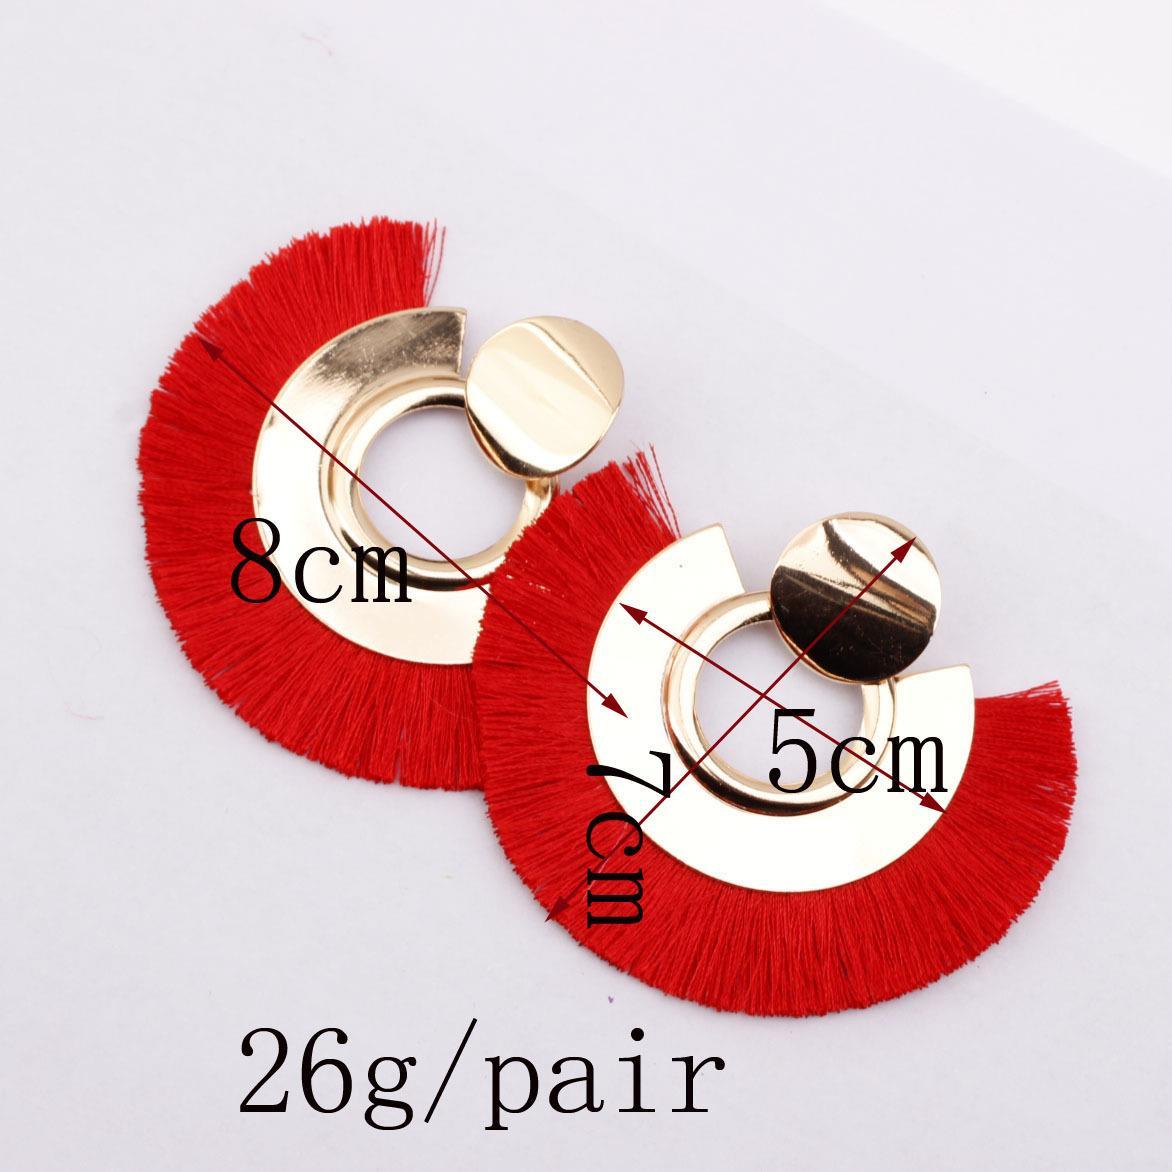 Women-Fashion-Rhinestone-Long-Tassel-Dangle-Earrings-Fringe-Drop-Jewelry-Gift-UK thumbnail 176